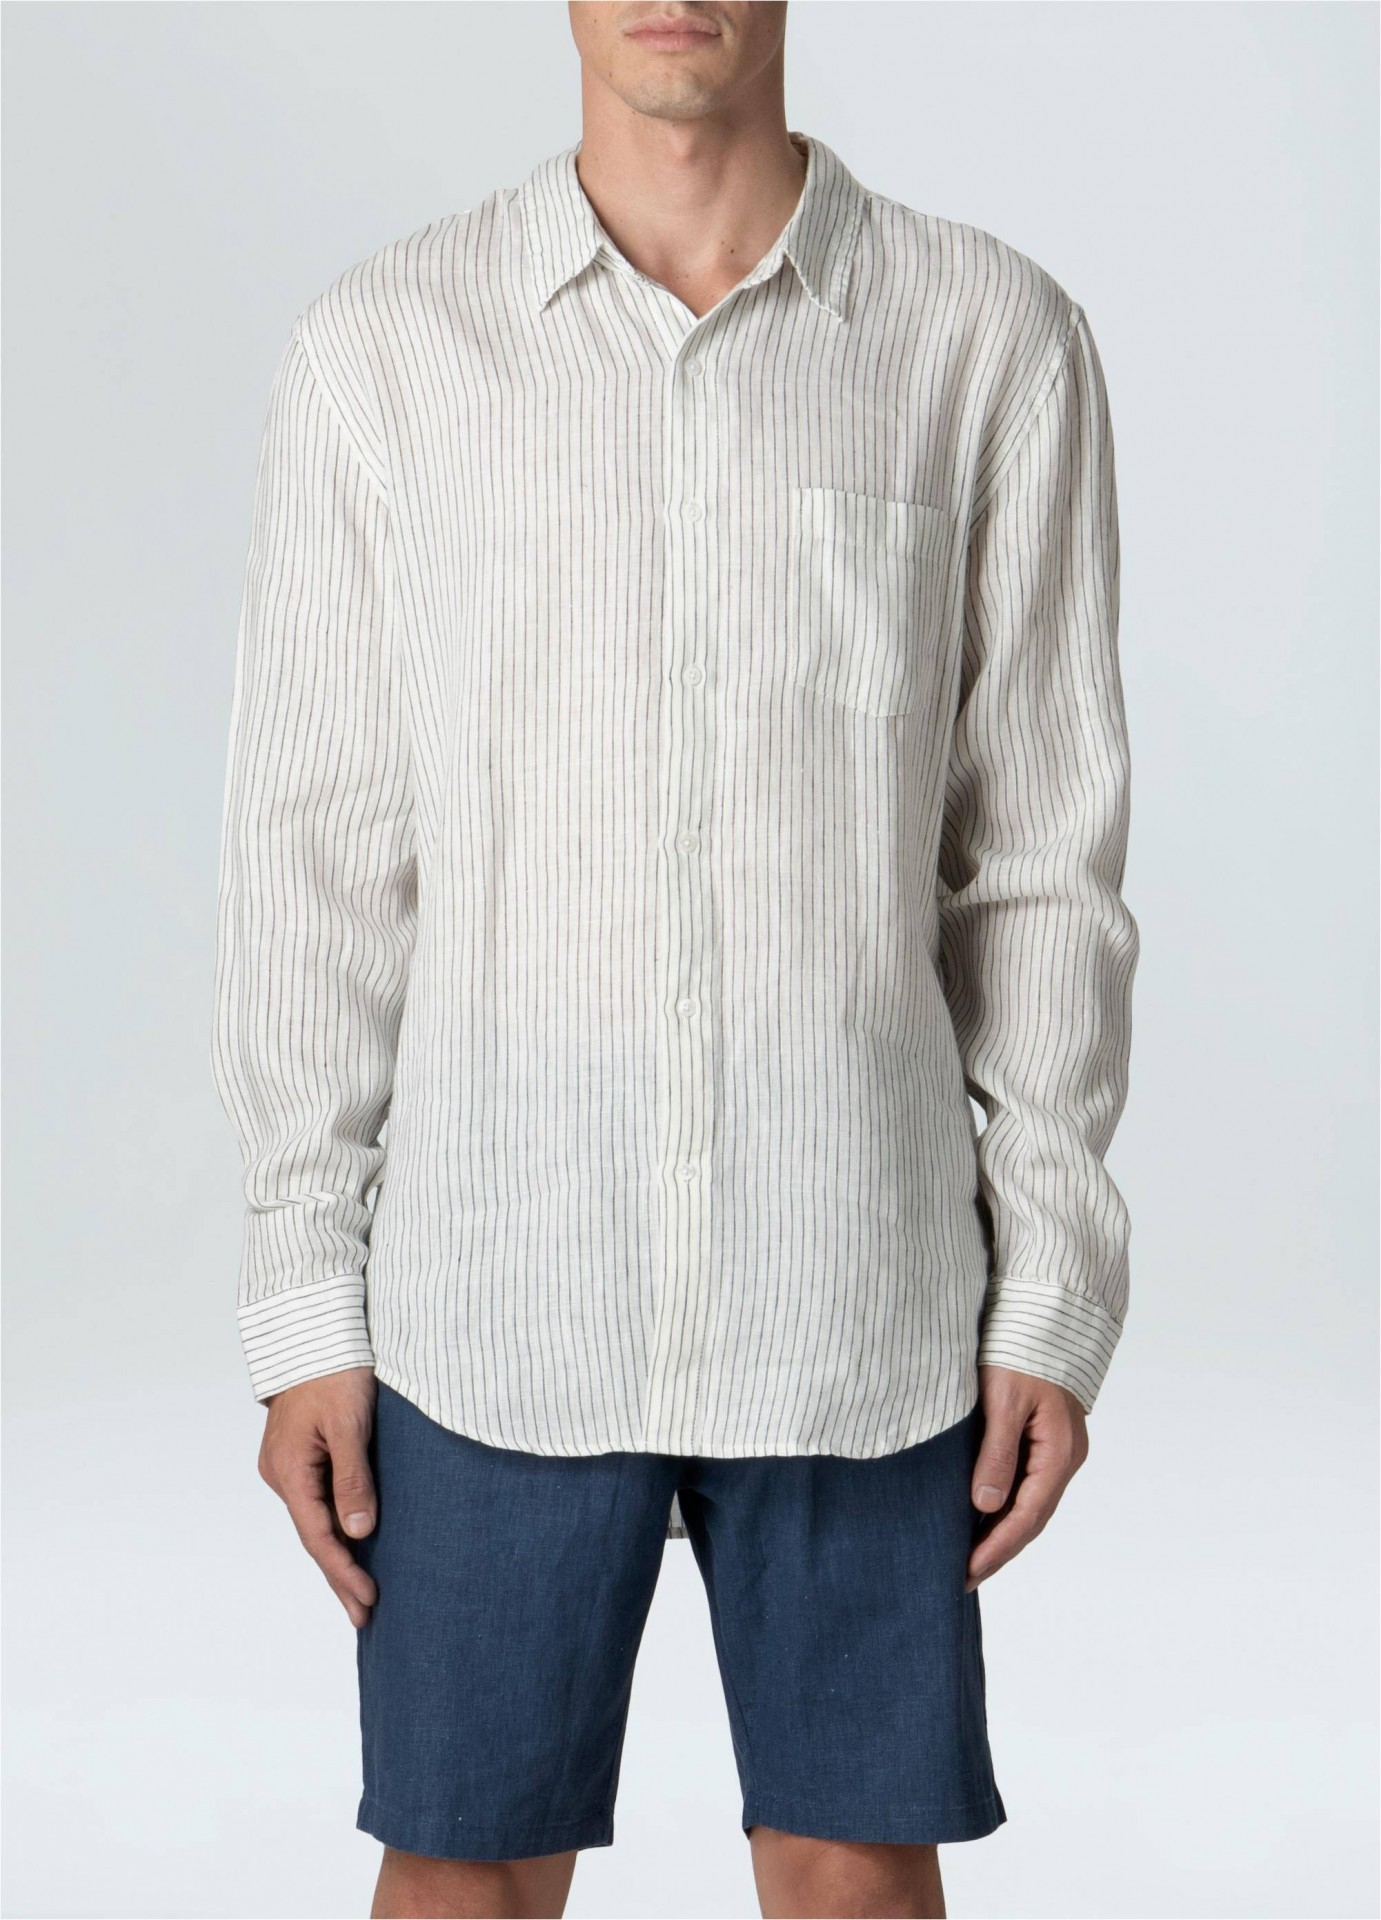 Camisa Masculina Linen Thin Stripes Ml